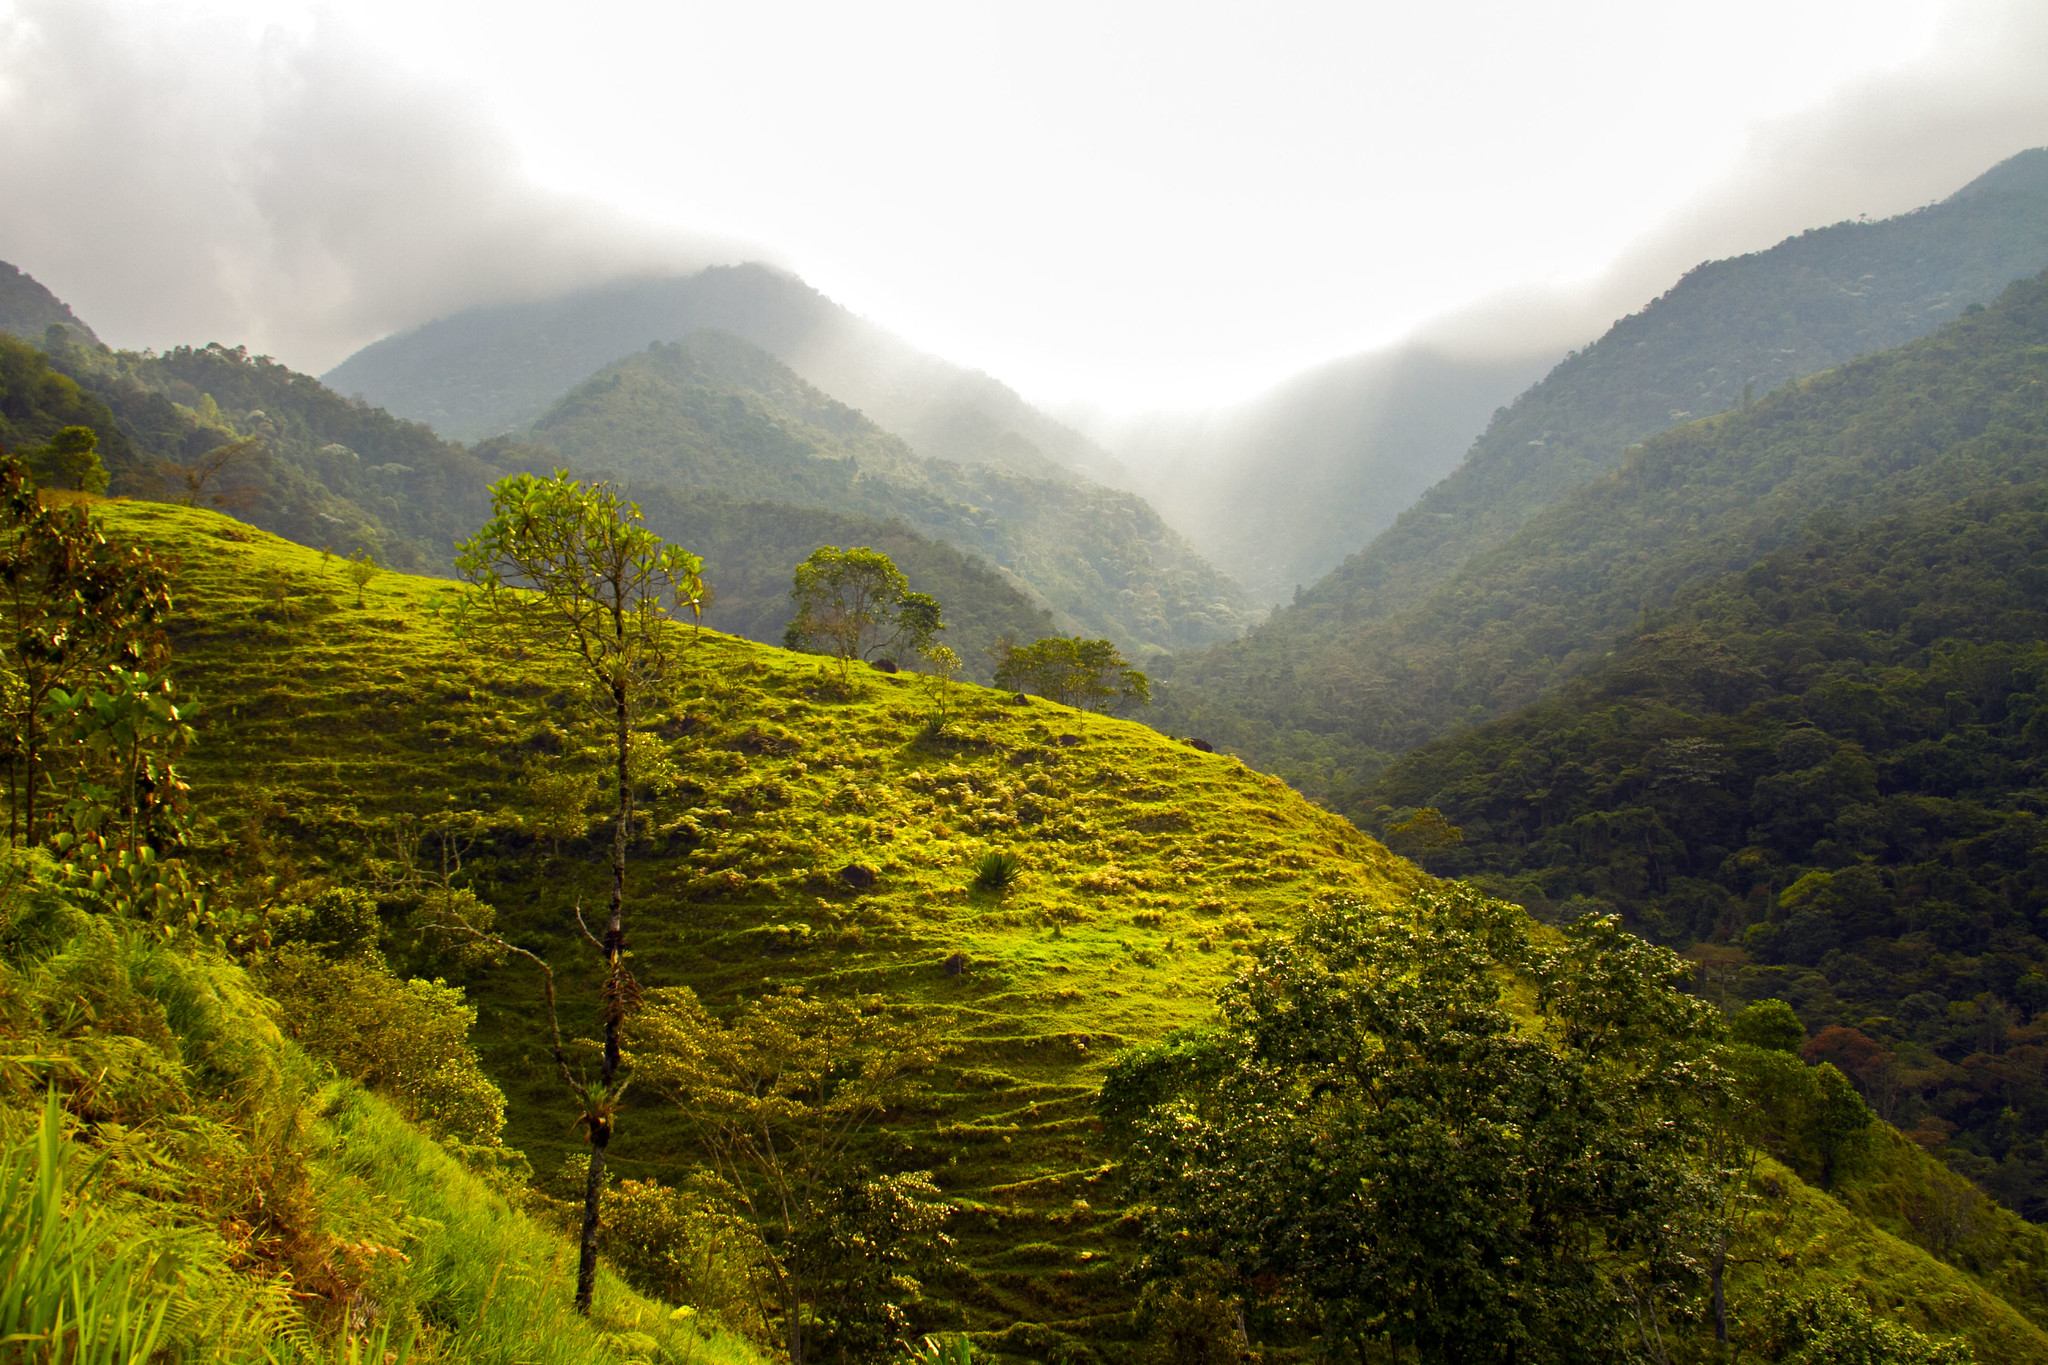 A farm landscape sits near a national park in Costa Rica